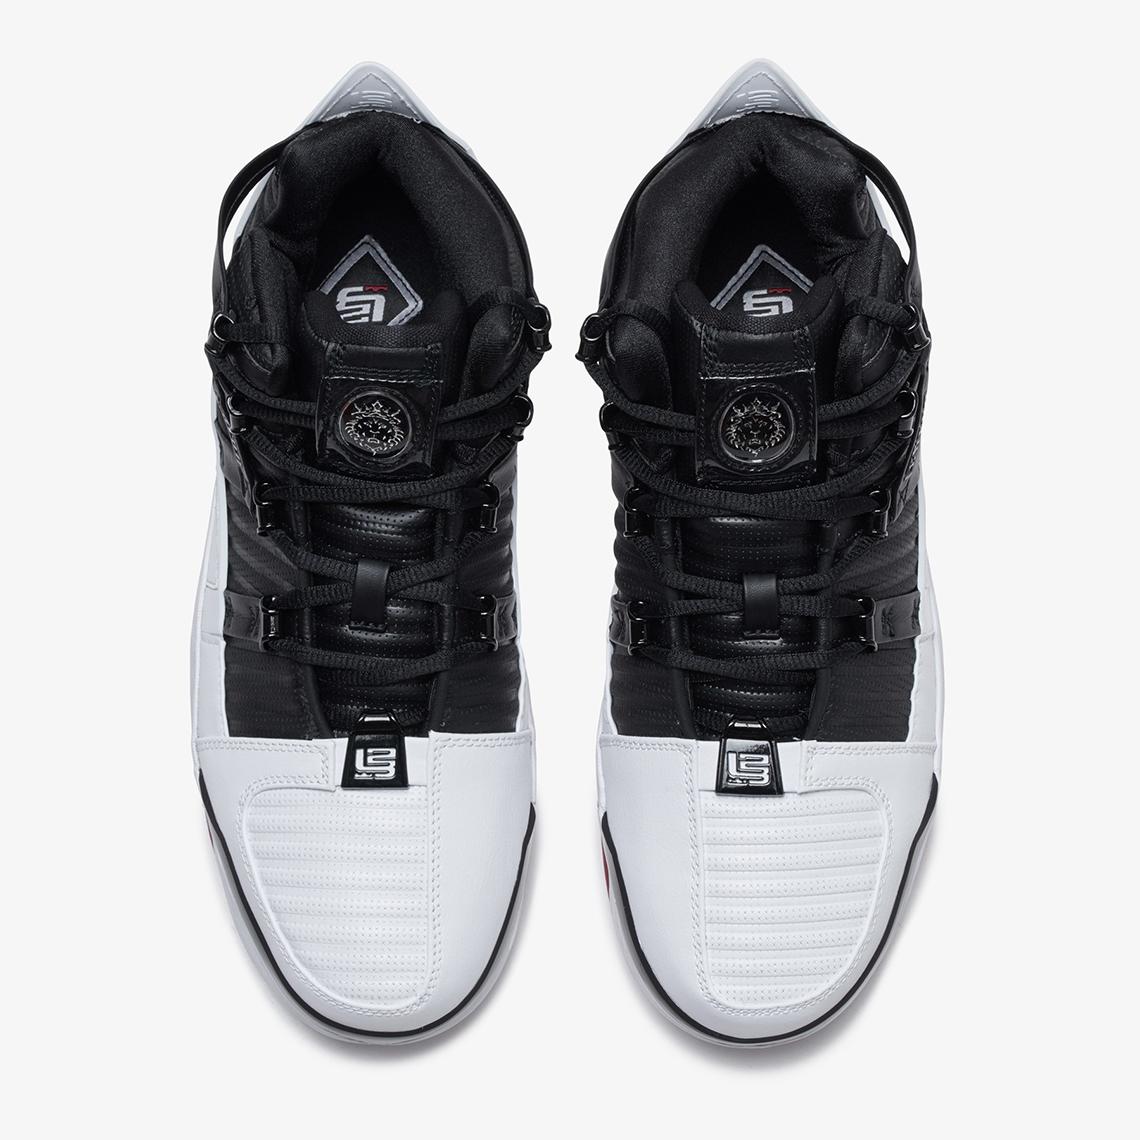 e59867cb2201 Nike LeBron 3 Home AO2434-101 Release Info